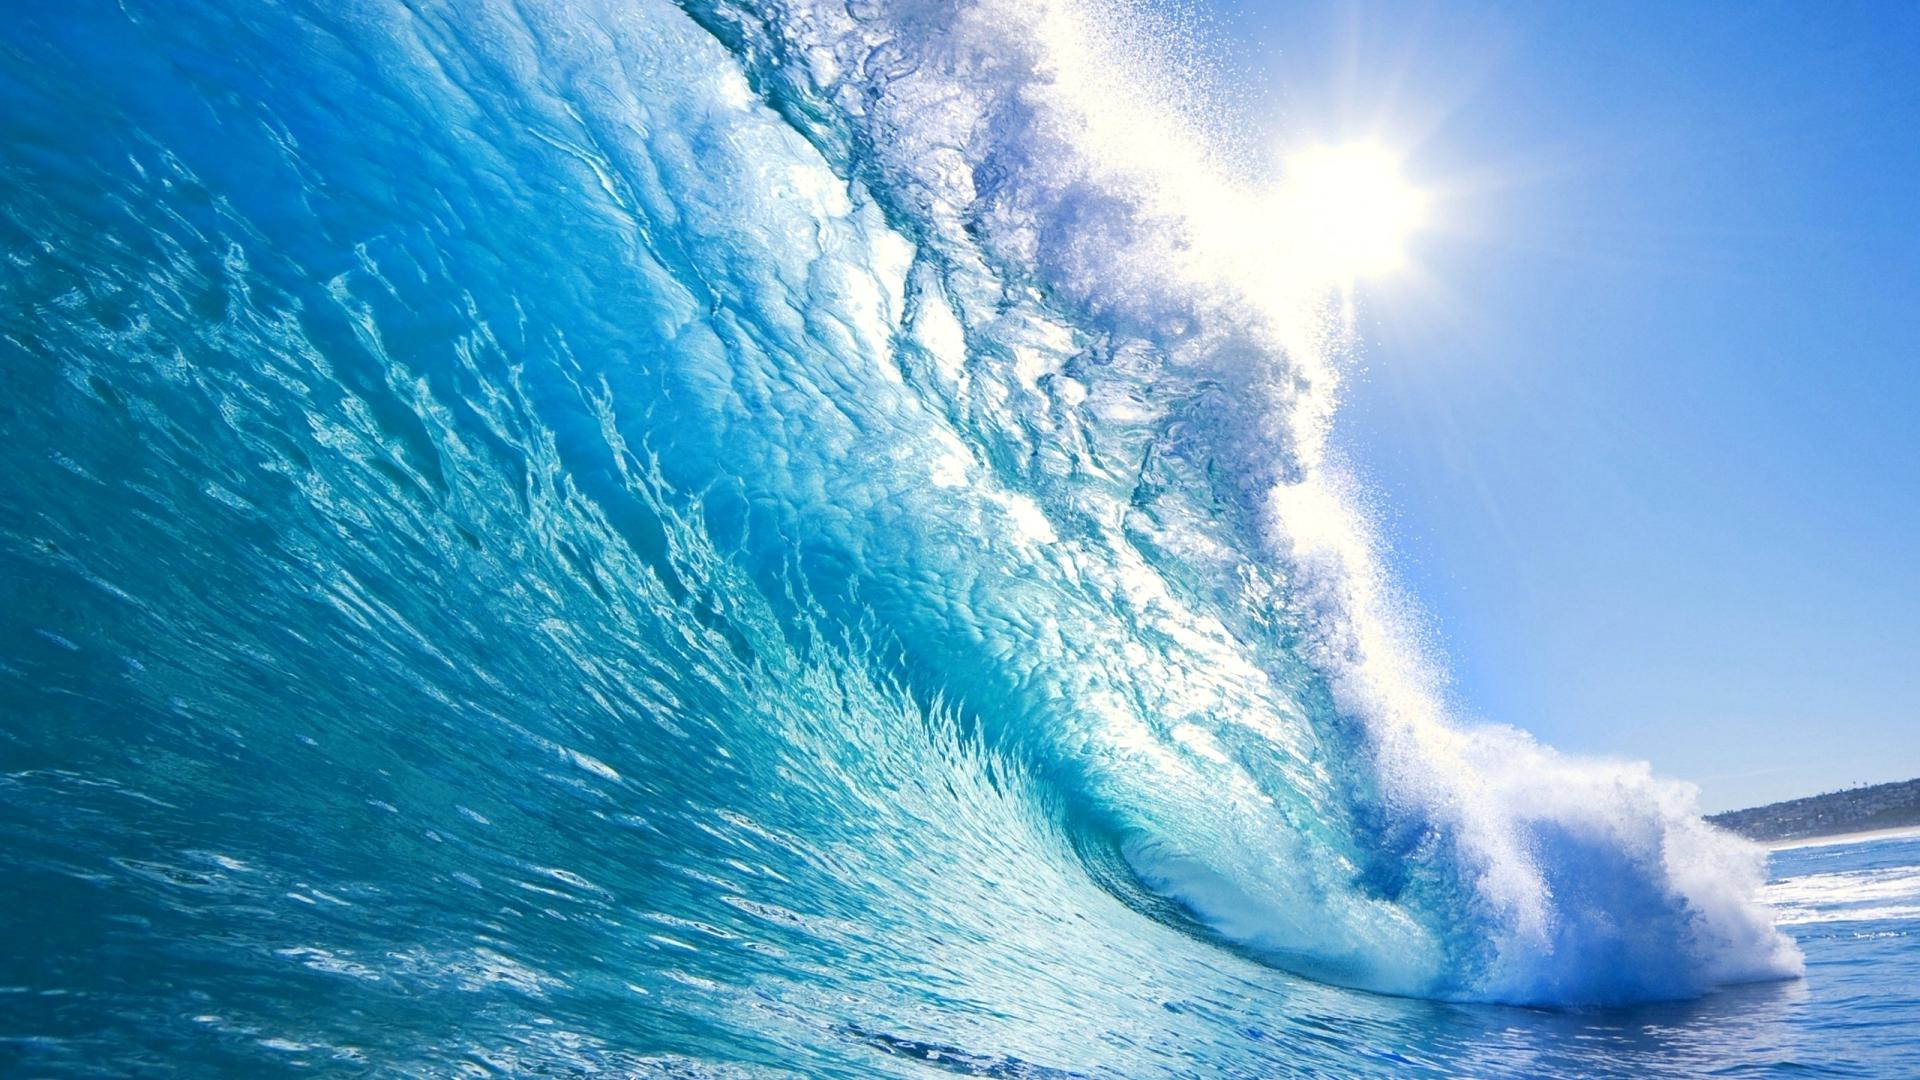 Beautiful Sea Wallpaper HD Freetopwallpapercom 1920x1080